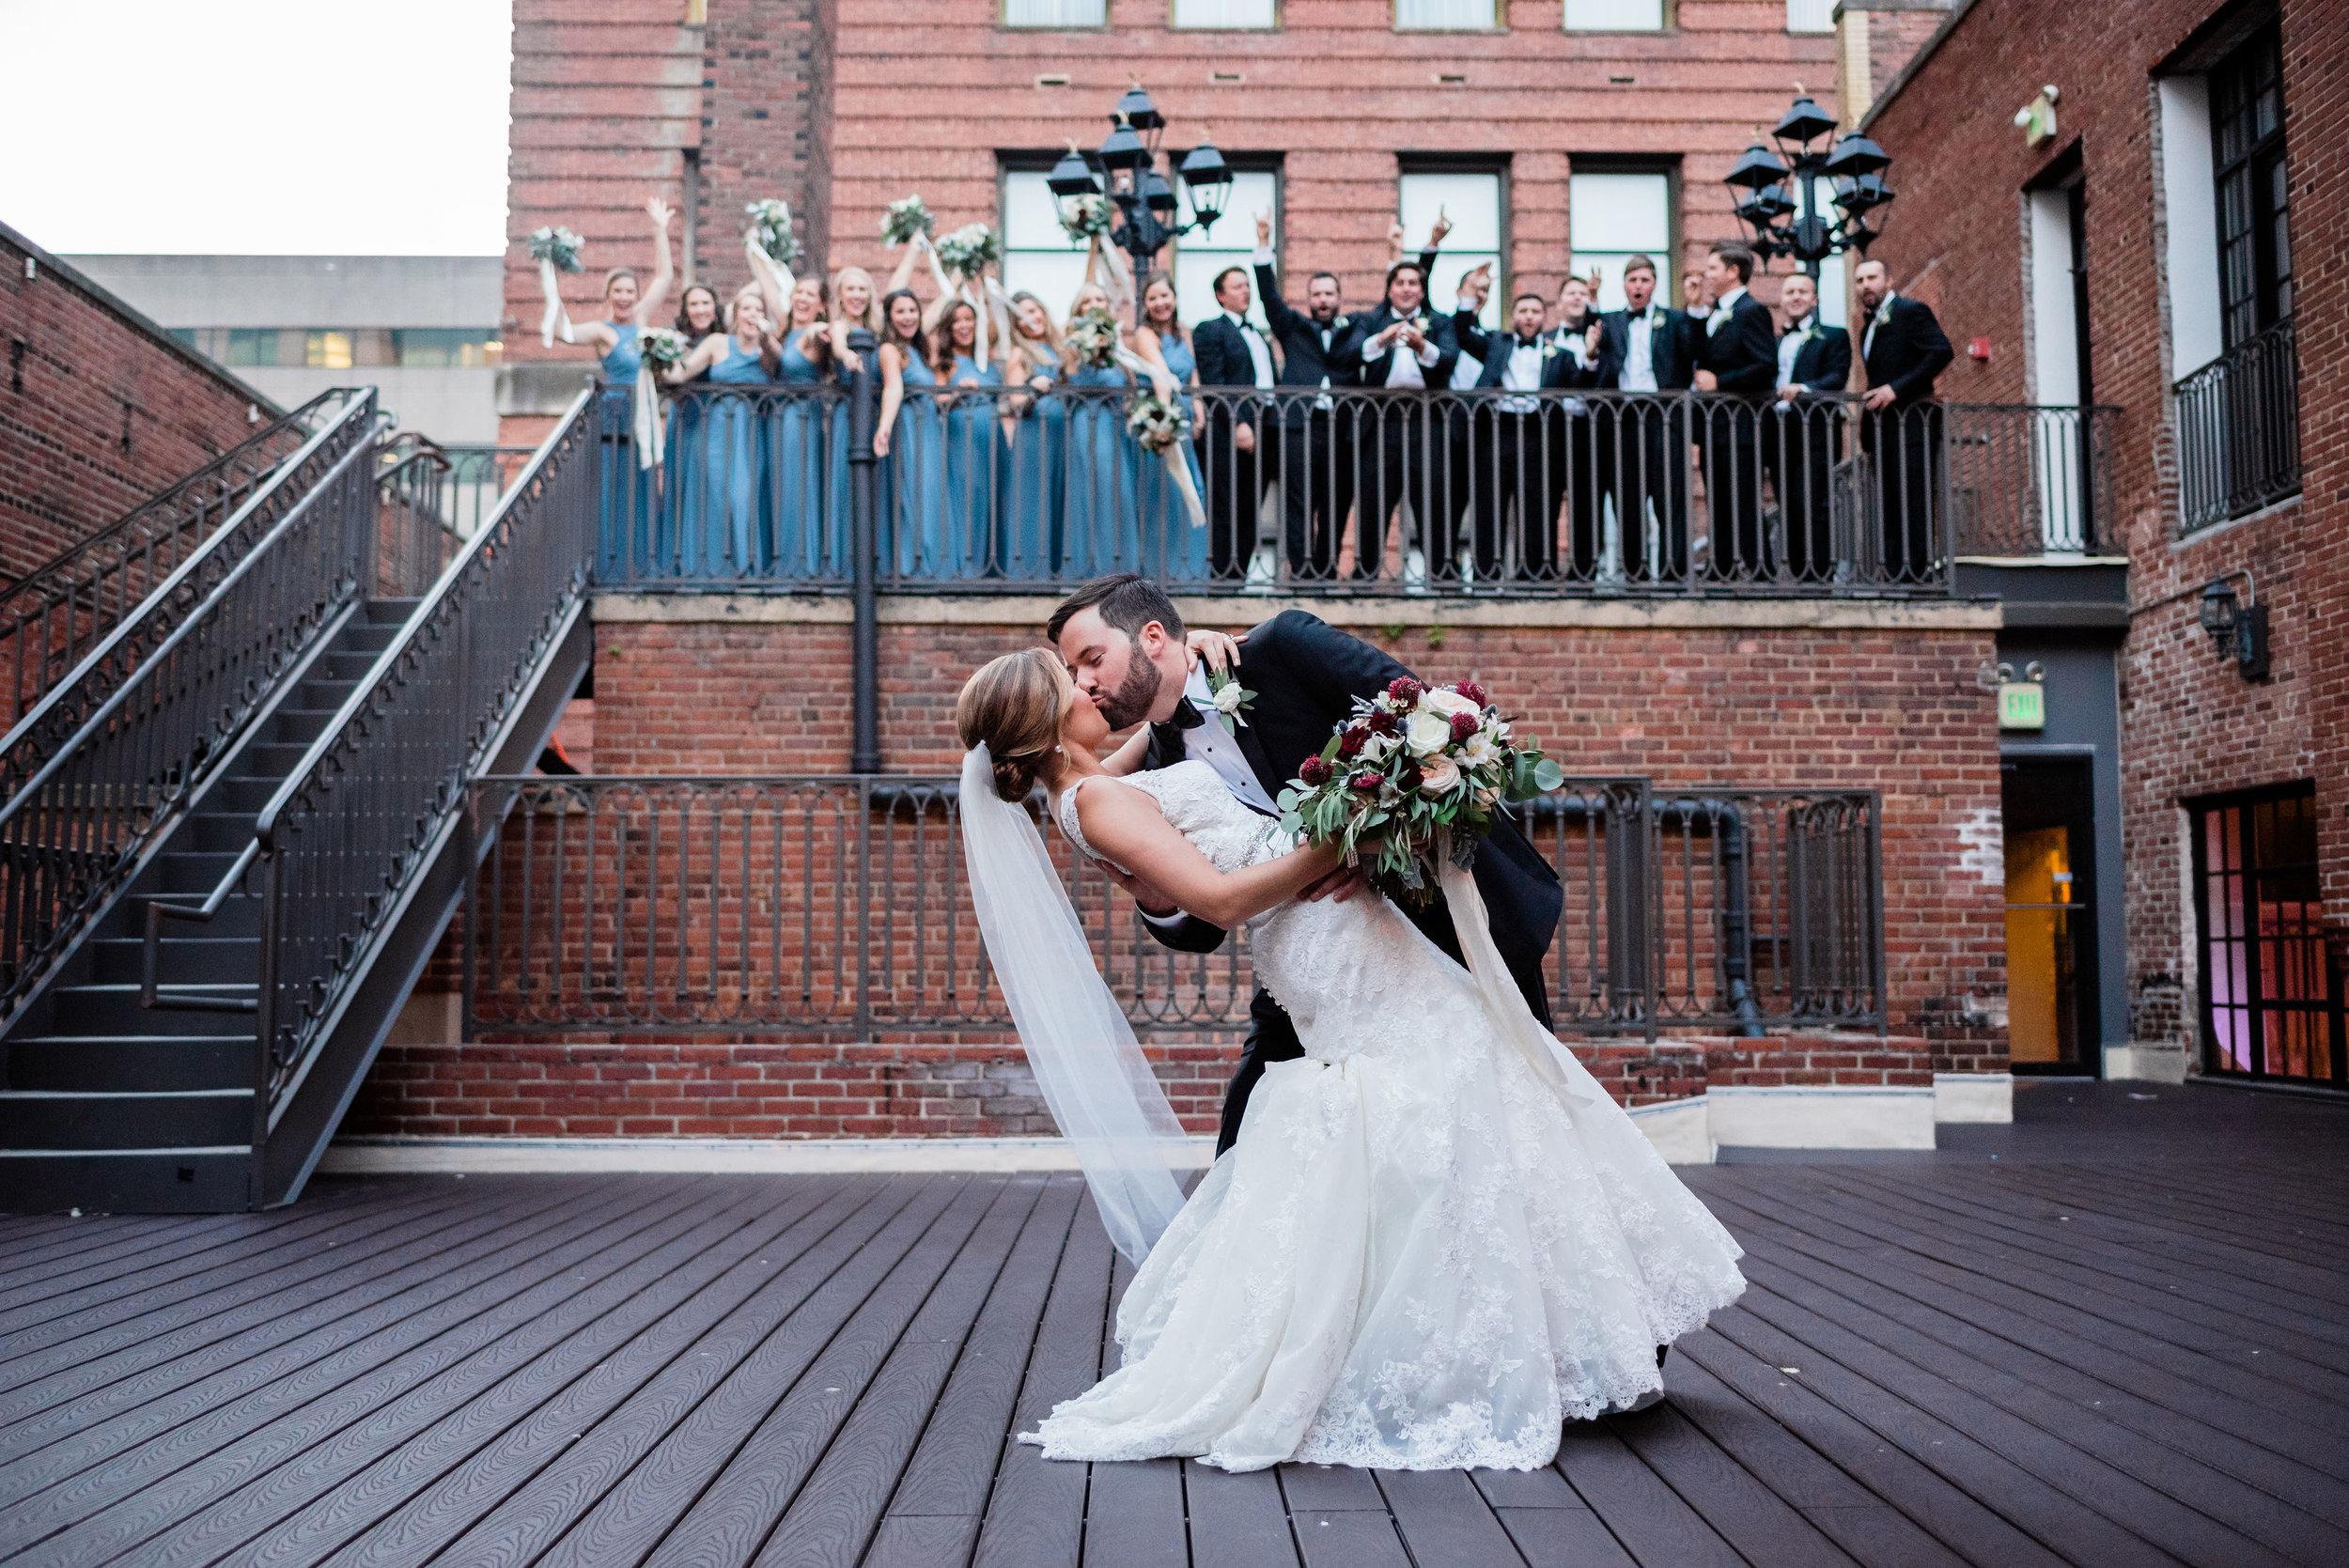 Darden_Wedding-430.jpg